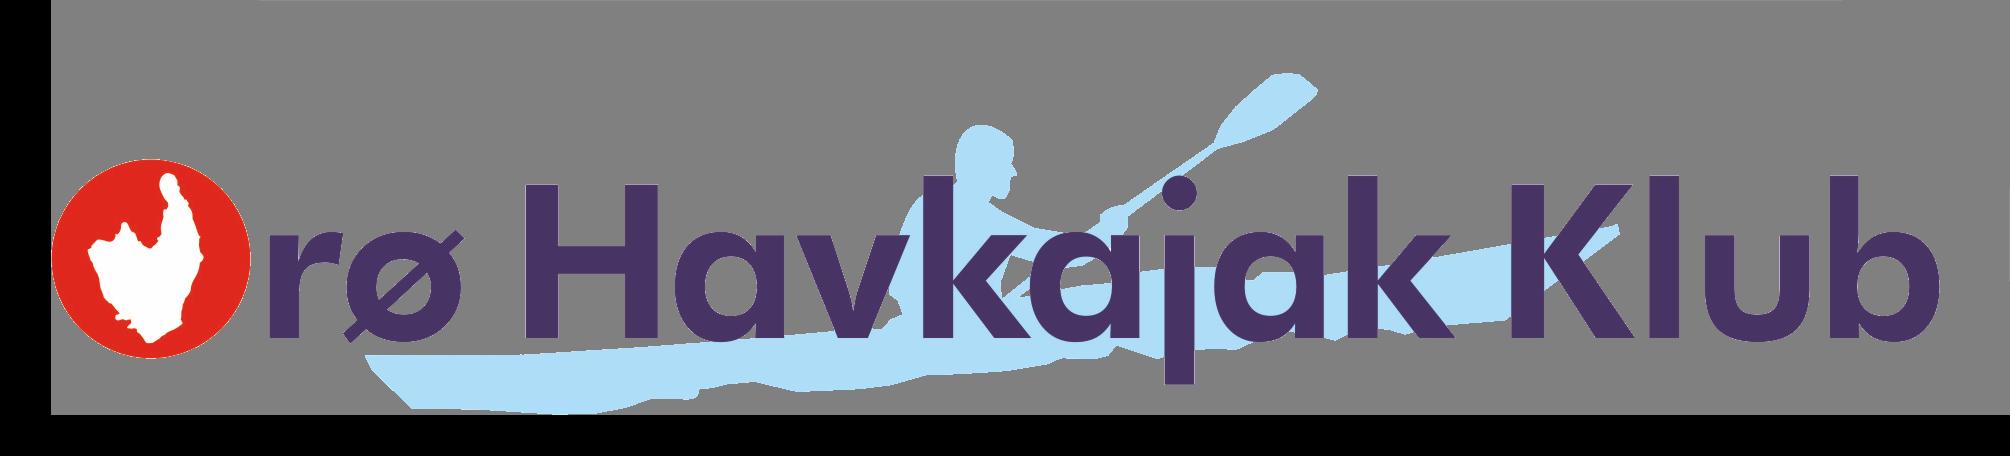 Orø Havkajakklub